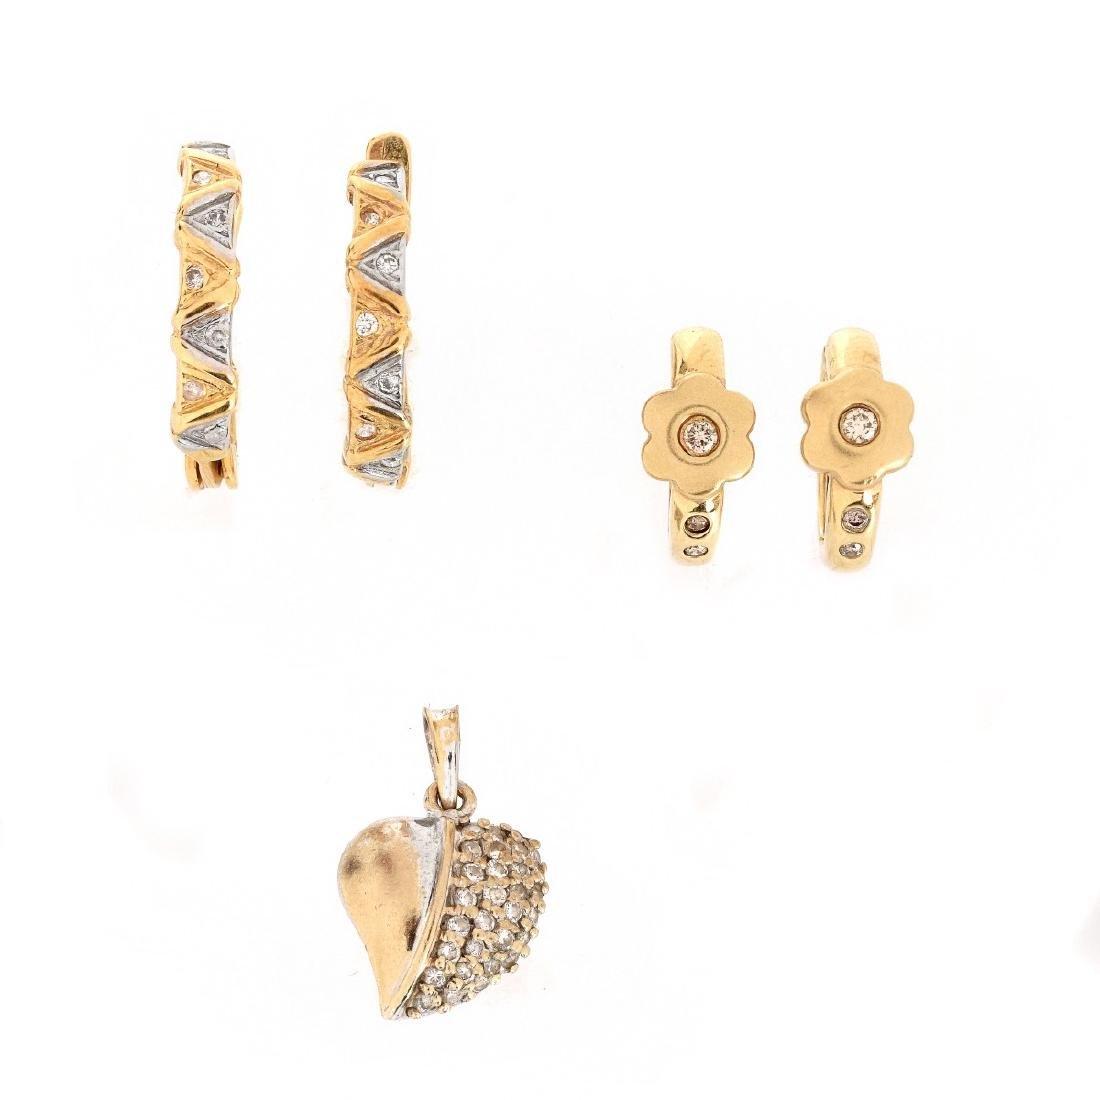 Delicate Diamond and 14K Jewelry Lot